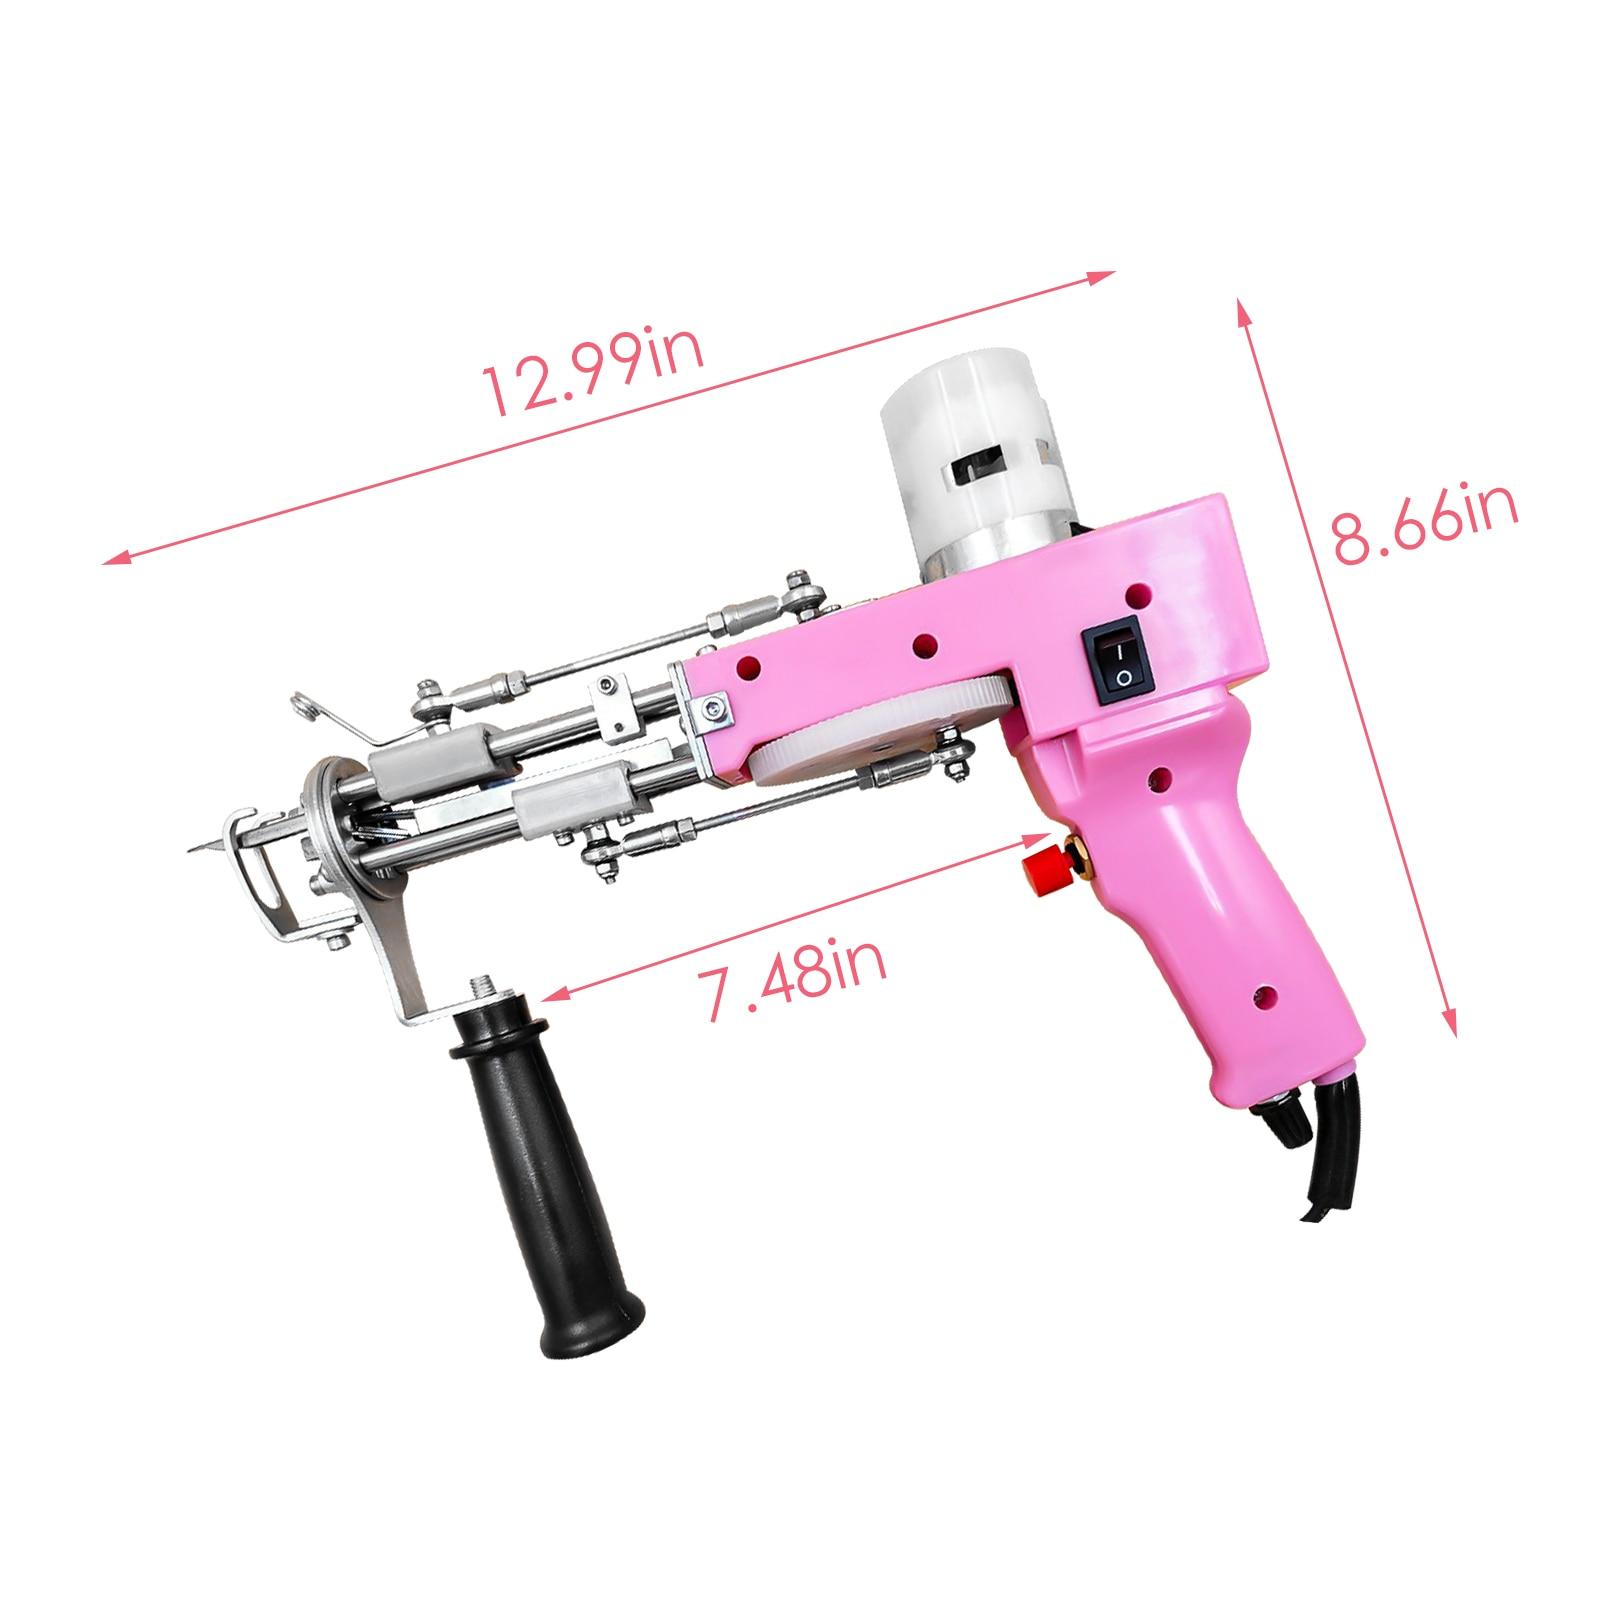 2 in 1 Pink Tufting Gun (Cut and Loop Pile) Electric Carpet Rug Guns Carpet Weaving Knitting Machine for DIY Knitting & Crochet enlarge